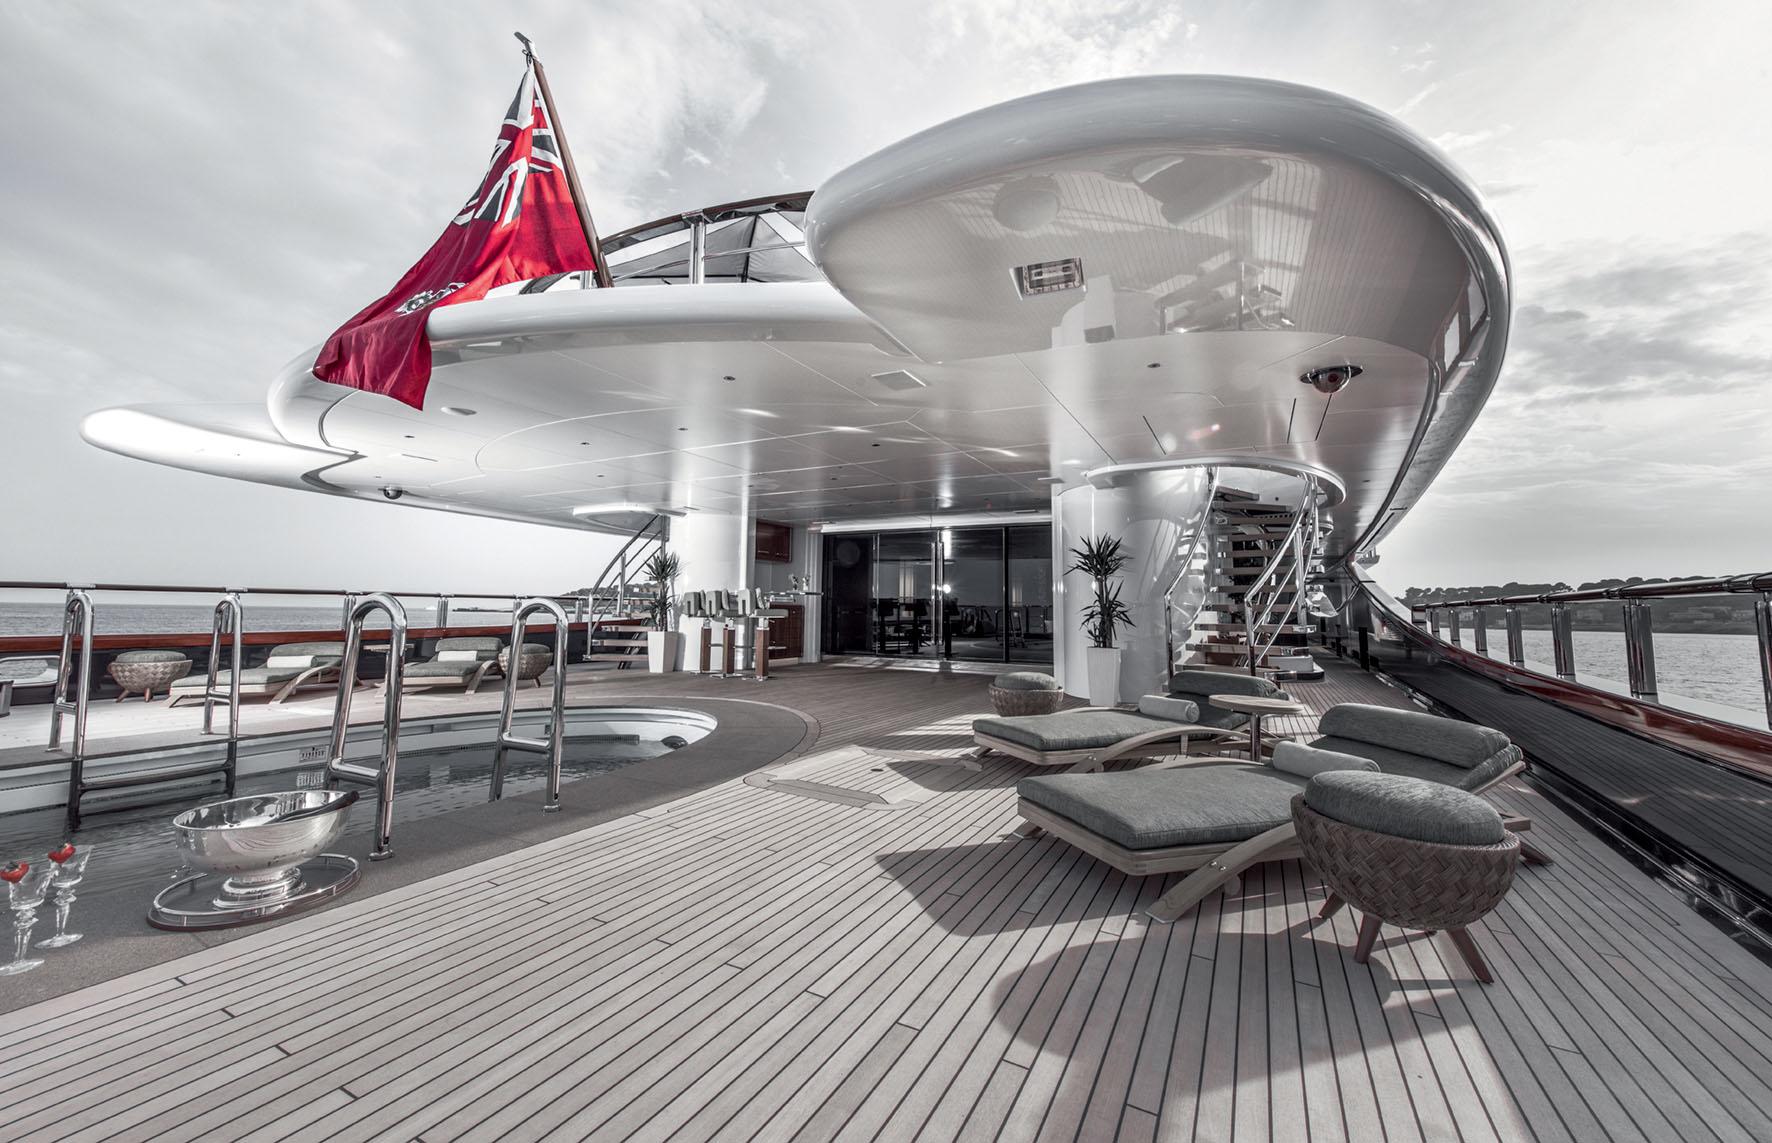 SuperyachtLife-On-The-High-Seas-Tony-Harris-Fort-Lauderdale-Venice-Magazine-2